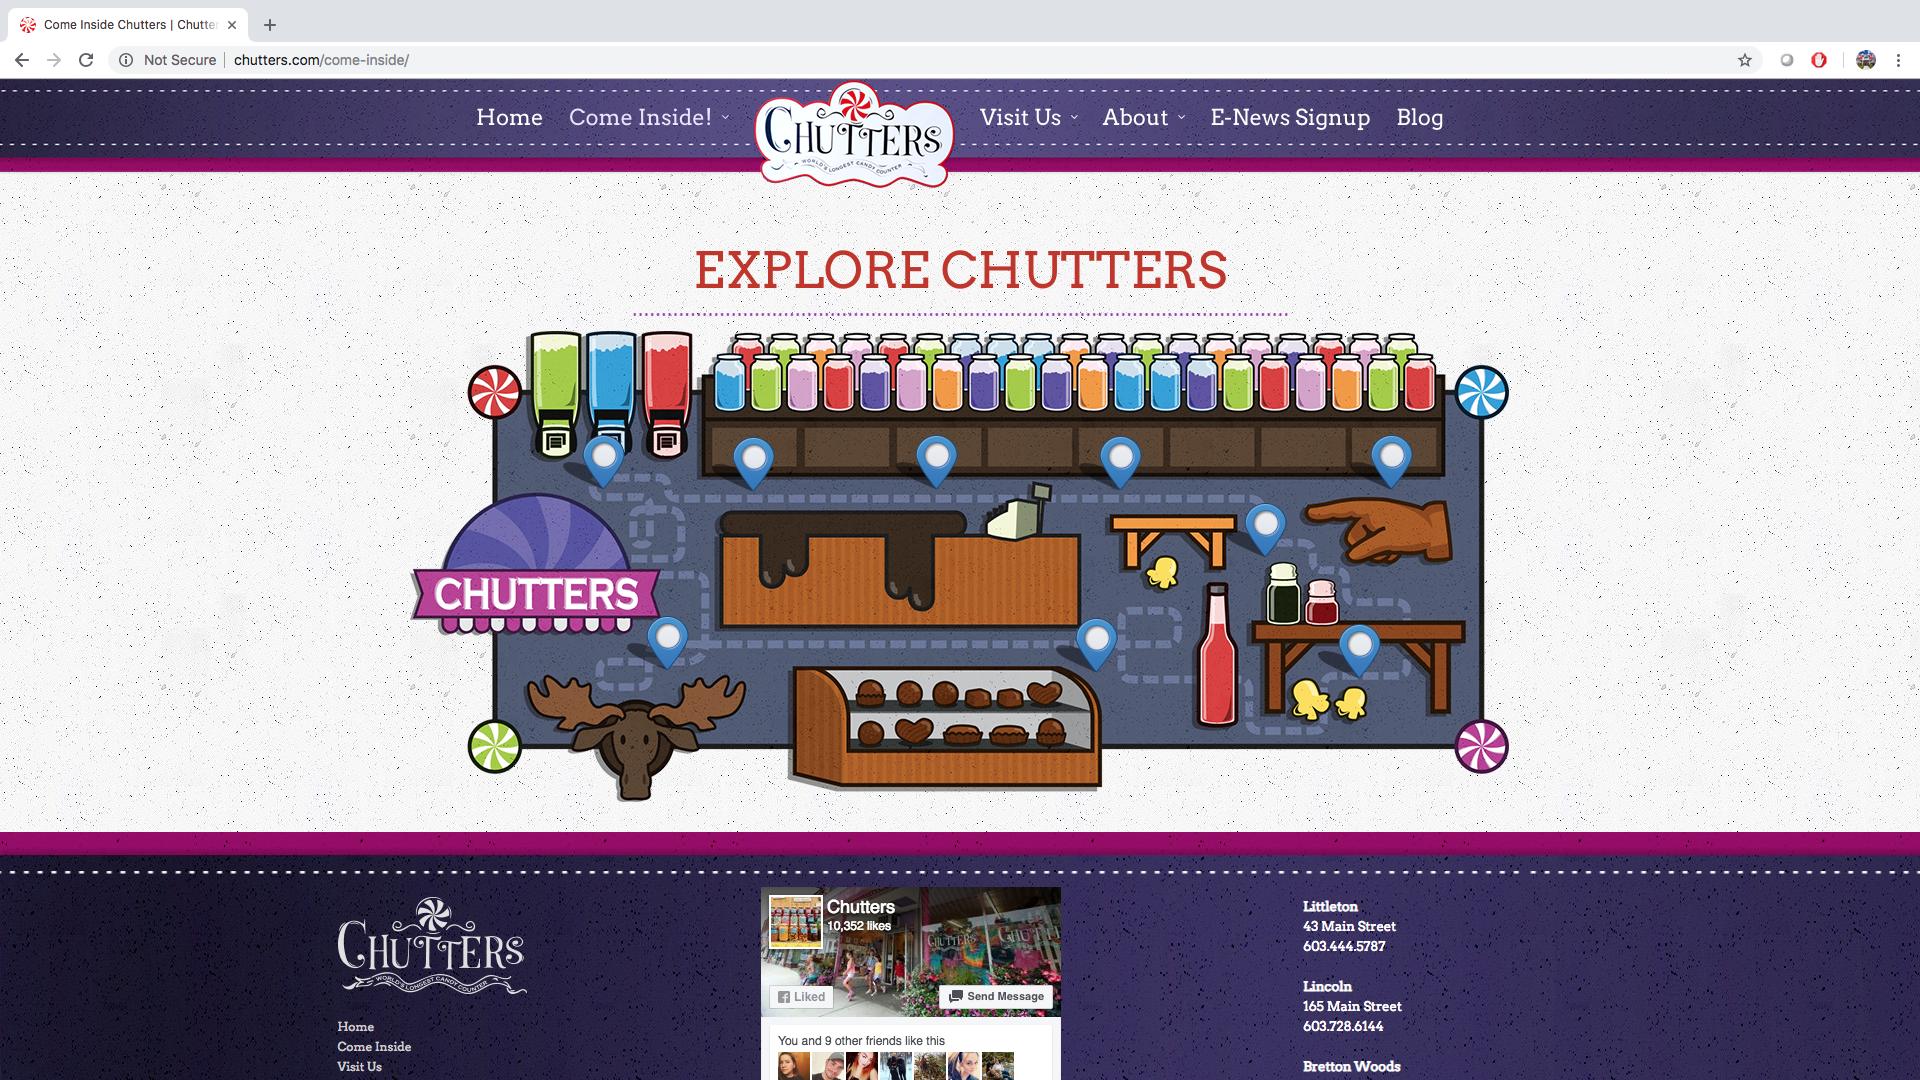 chutters map design